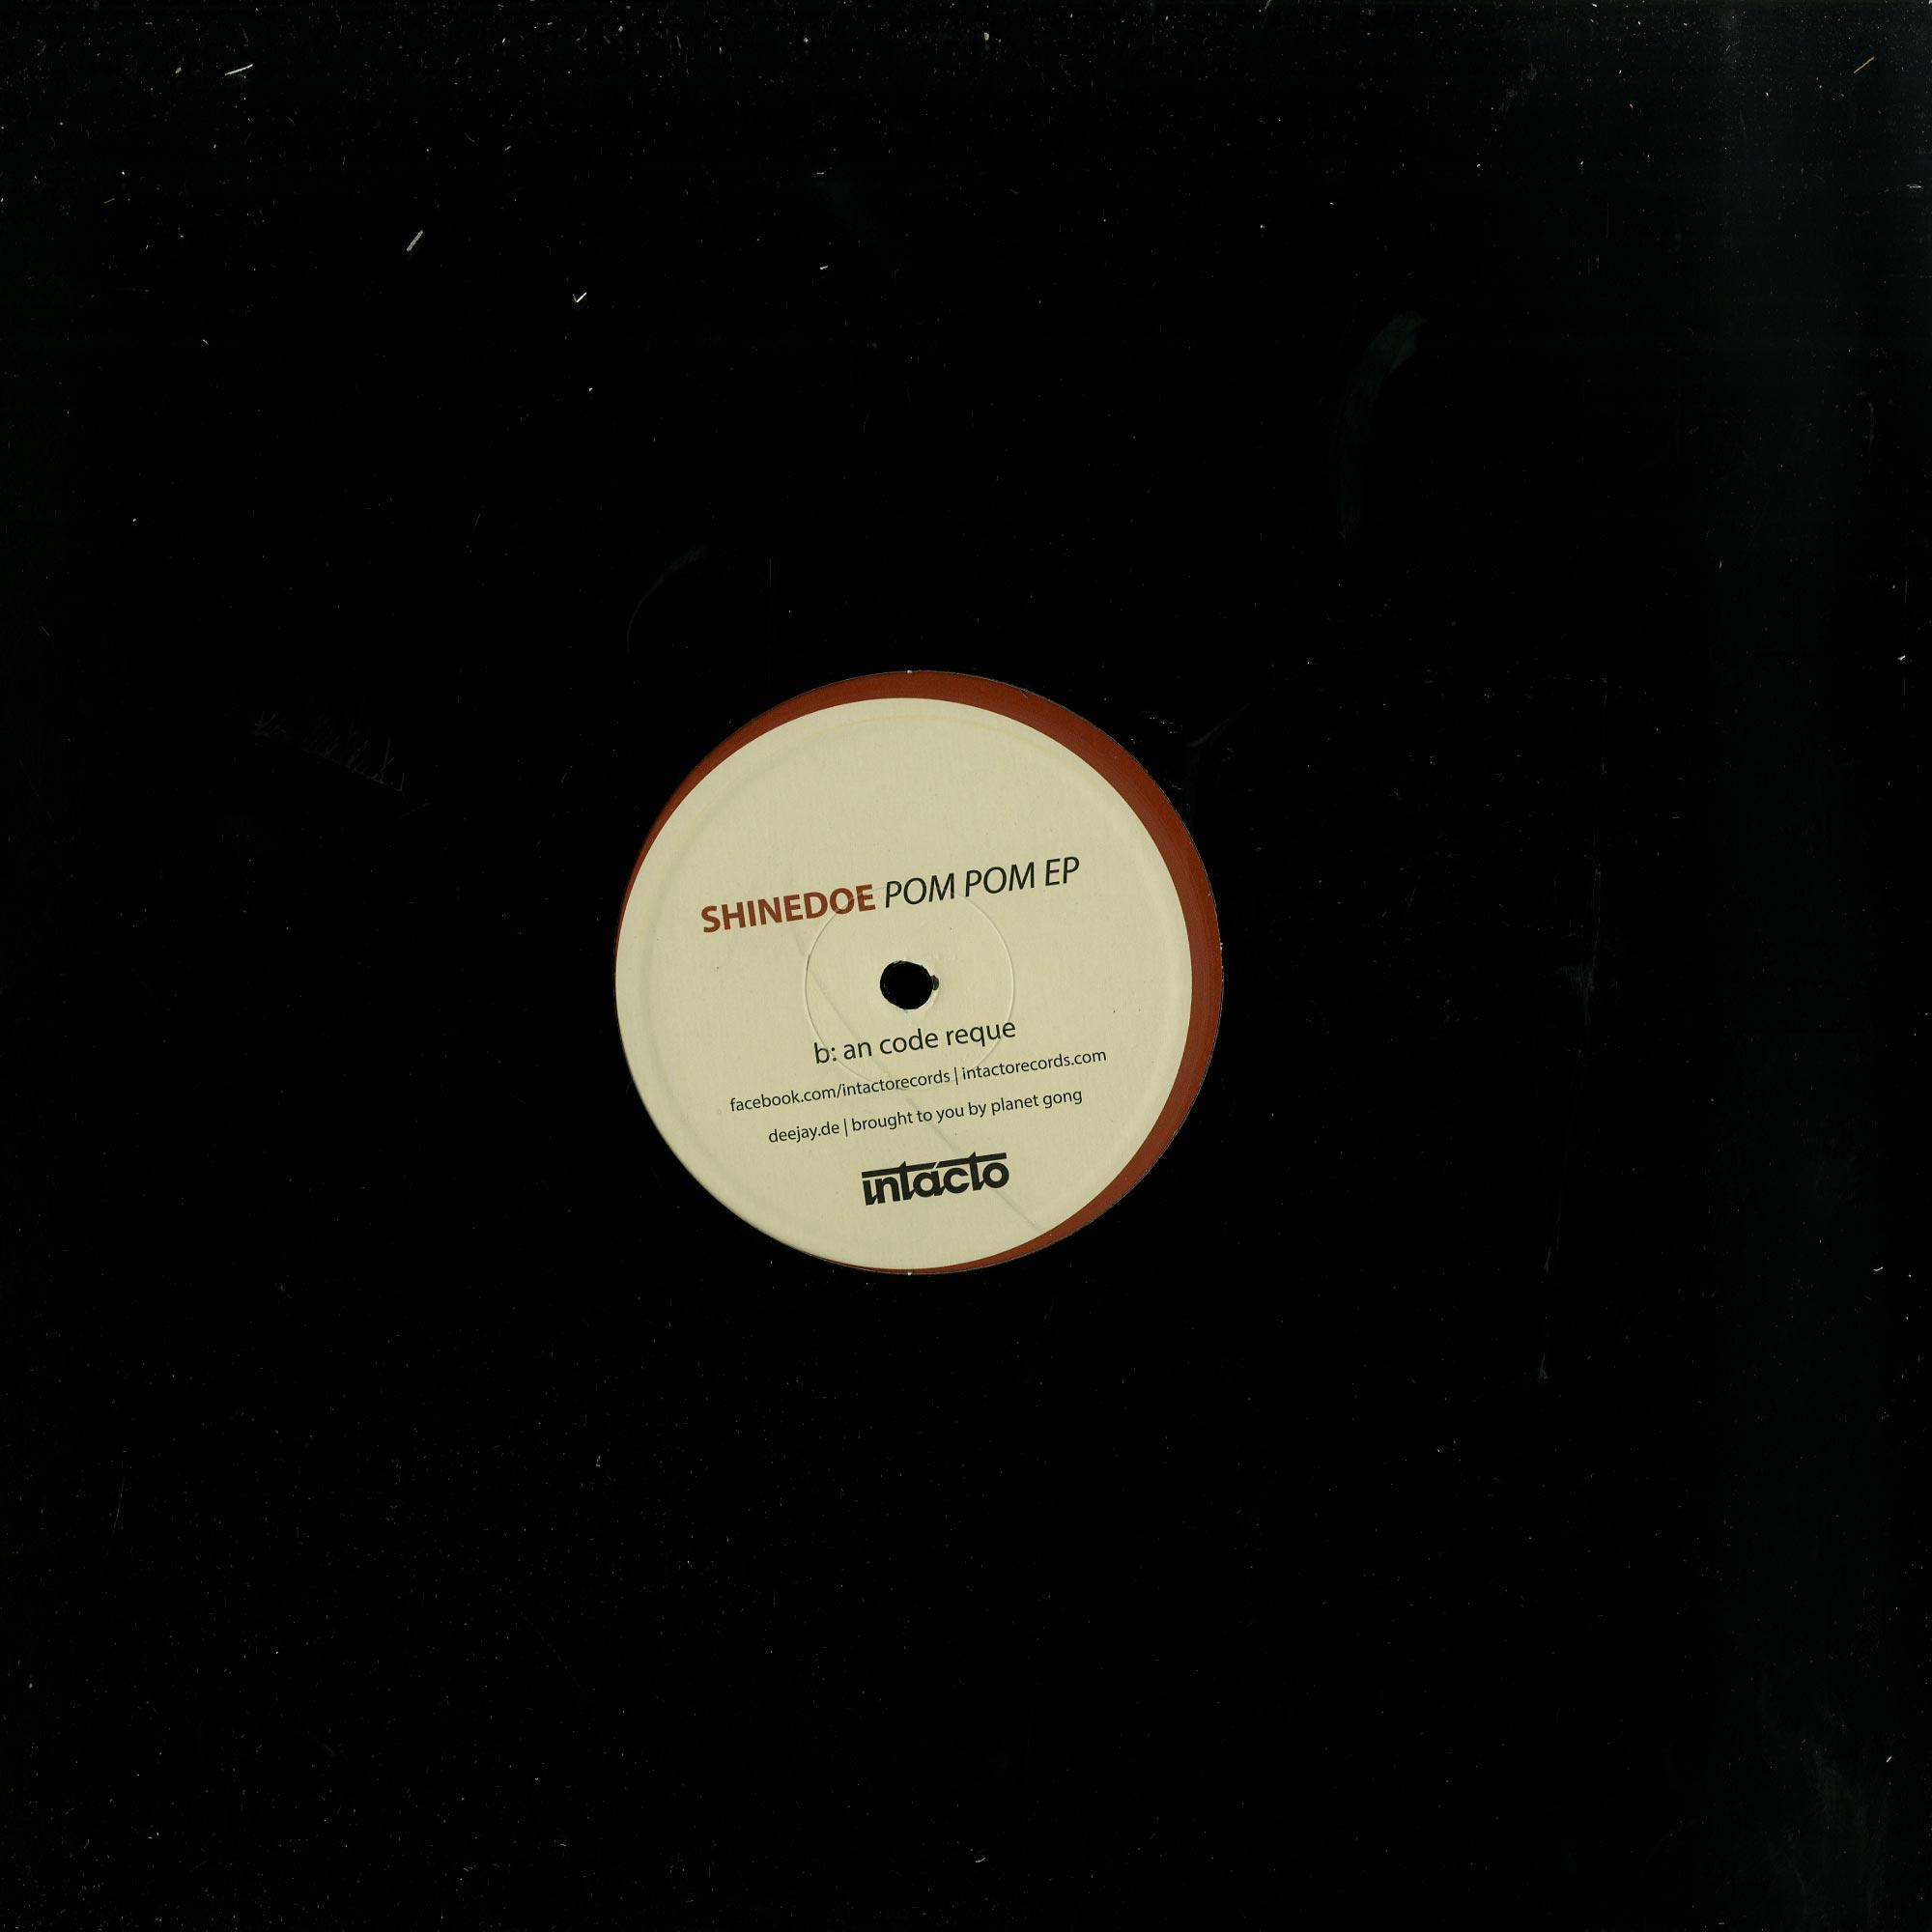 Shinedoe - POM POM EP